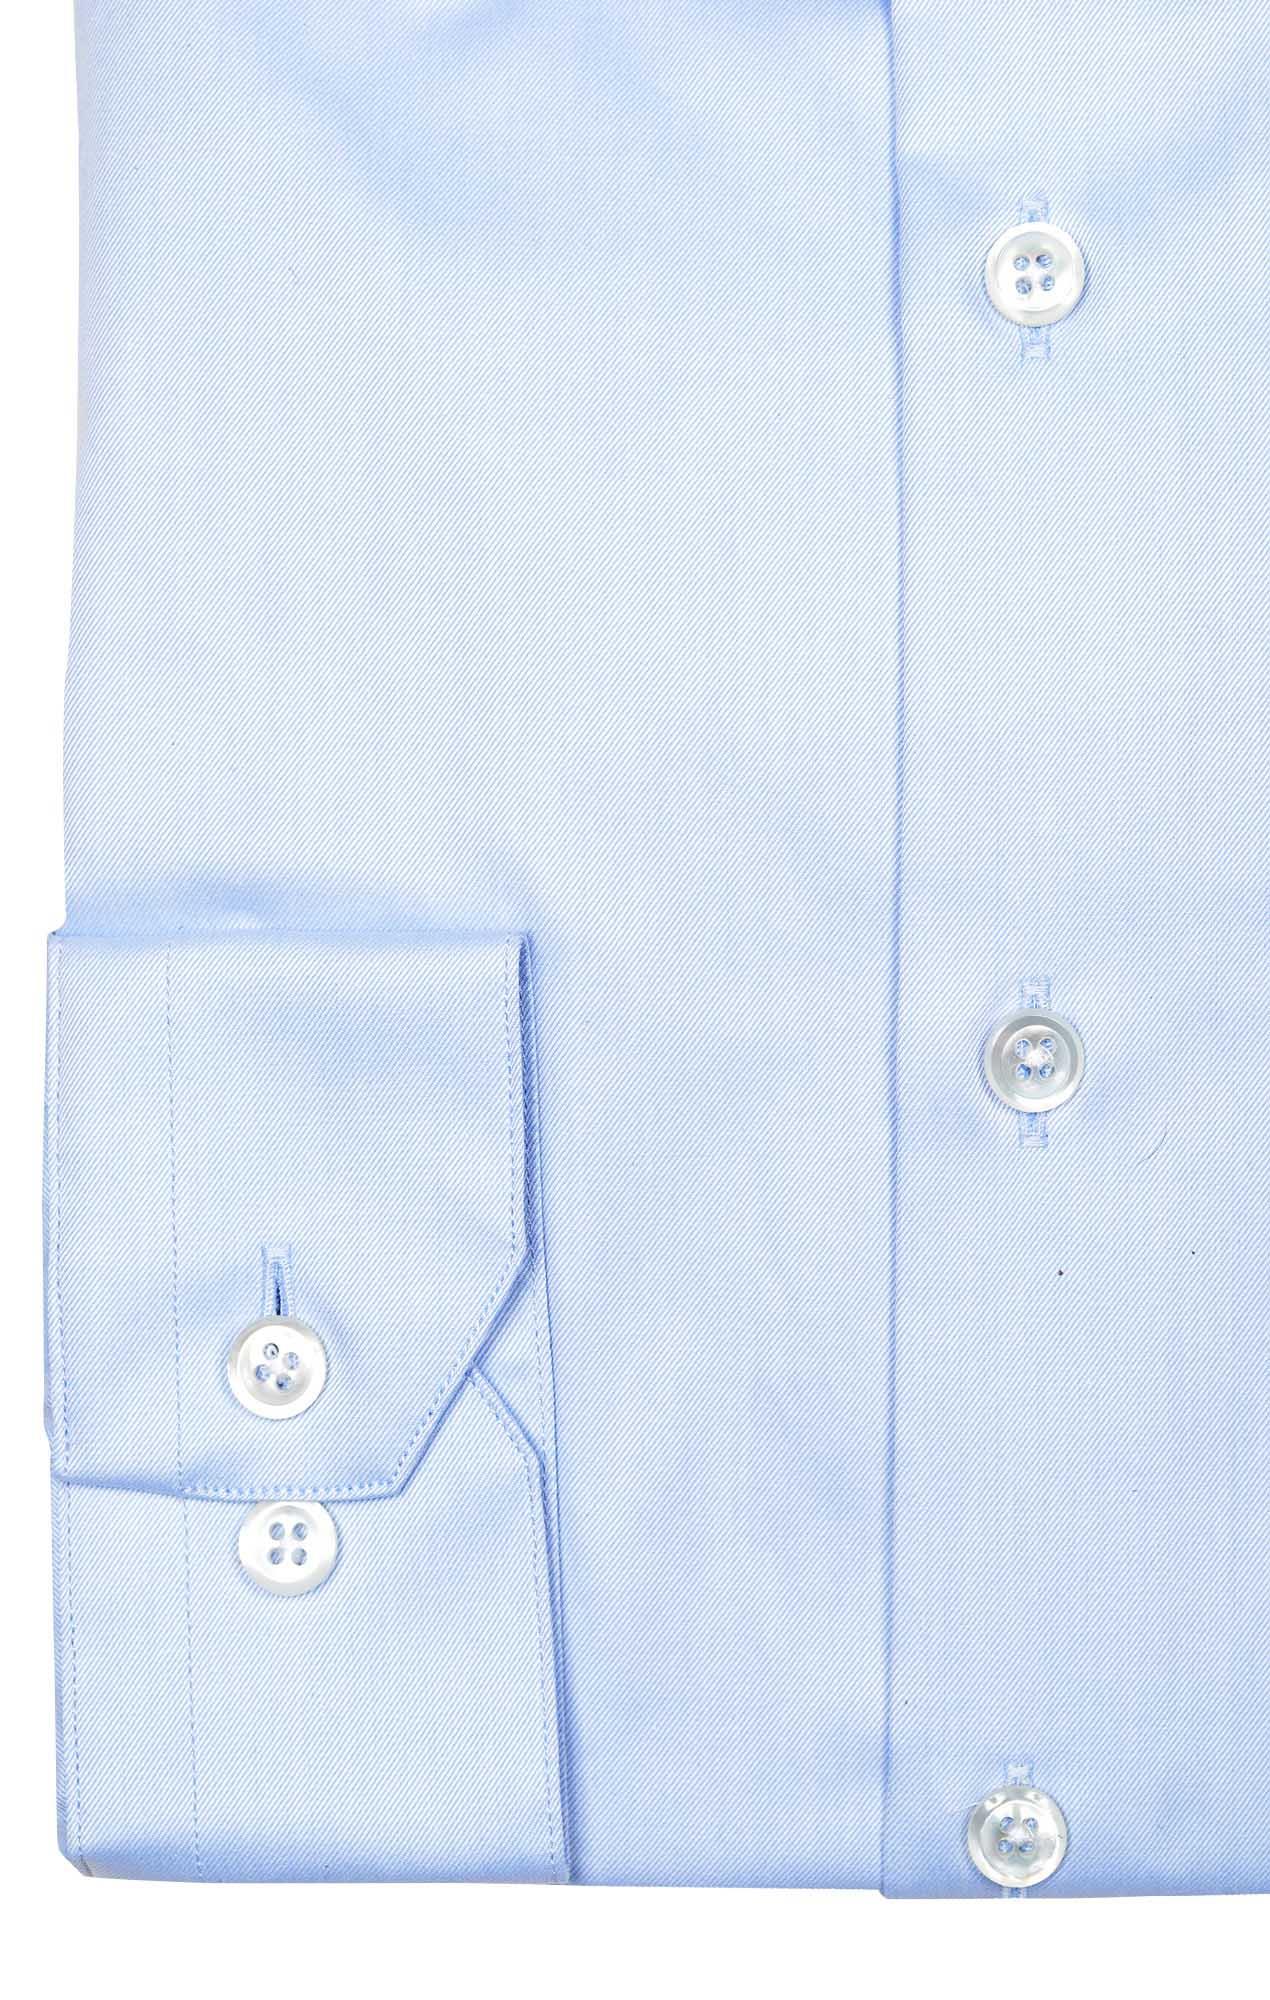 Chemise twill bleu clair Les chemises